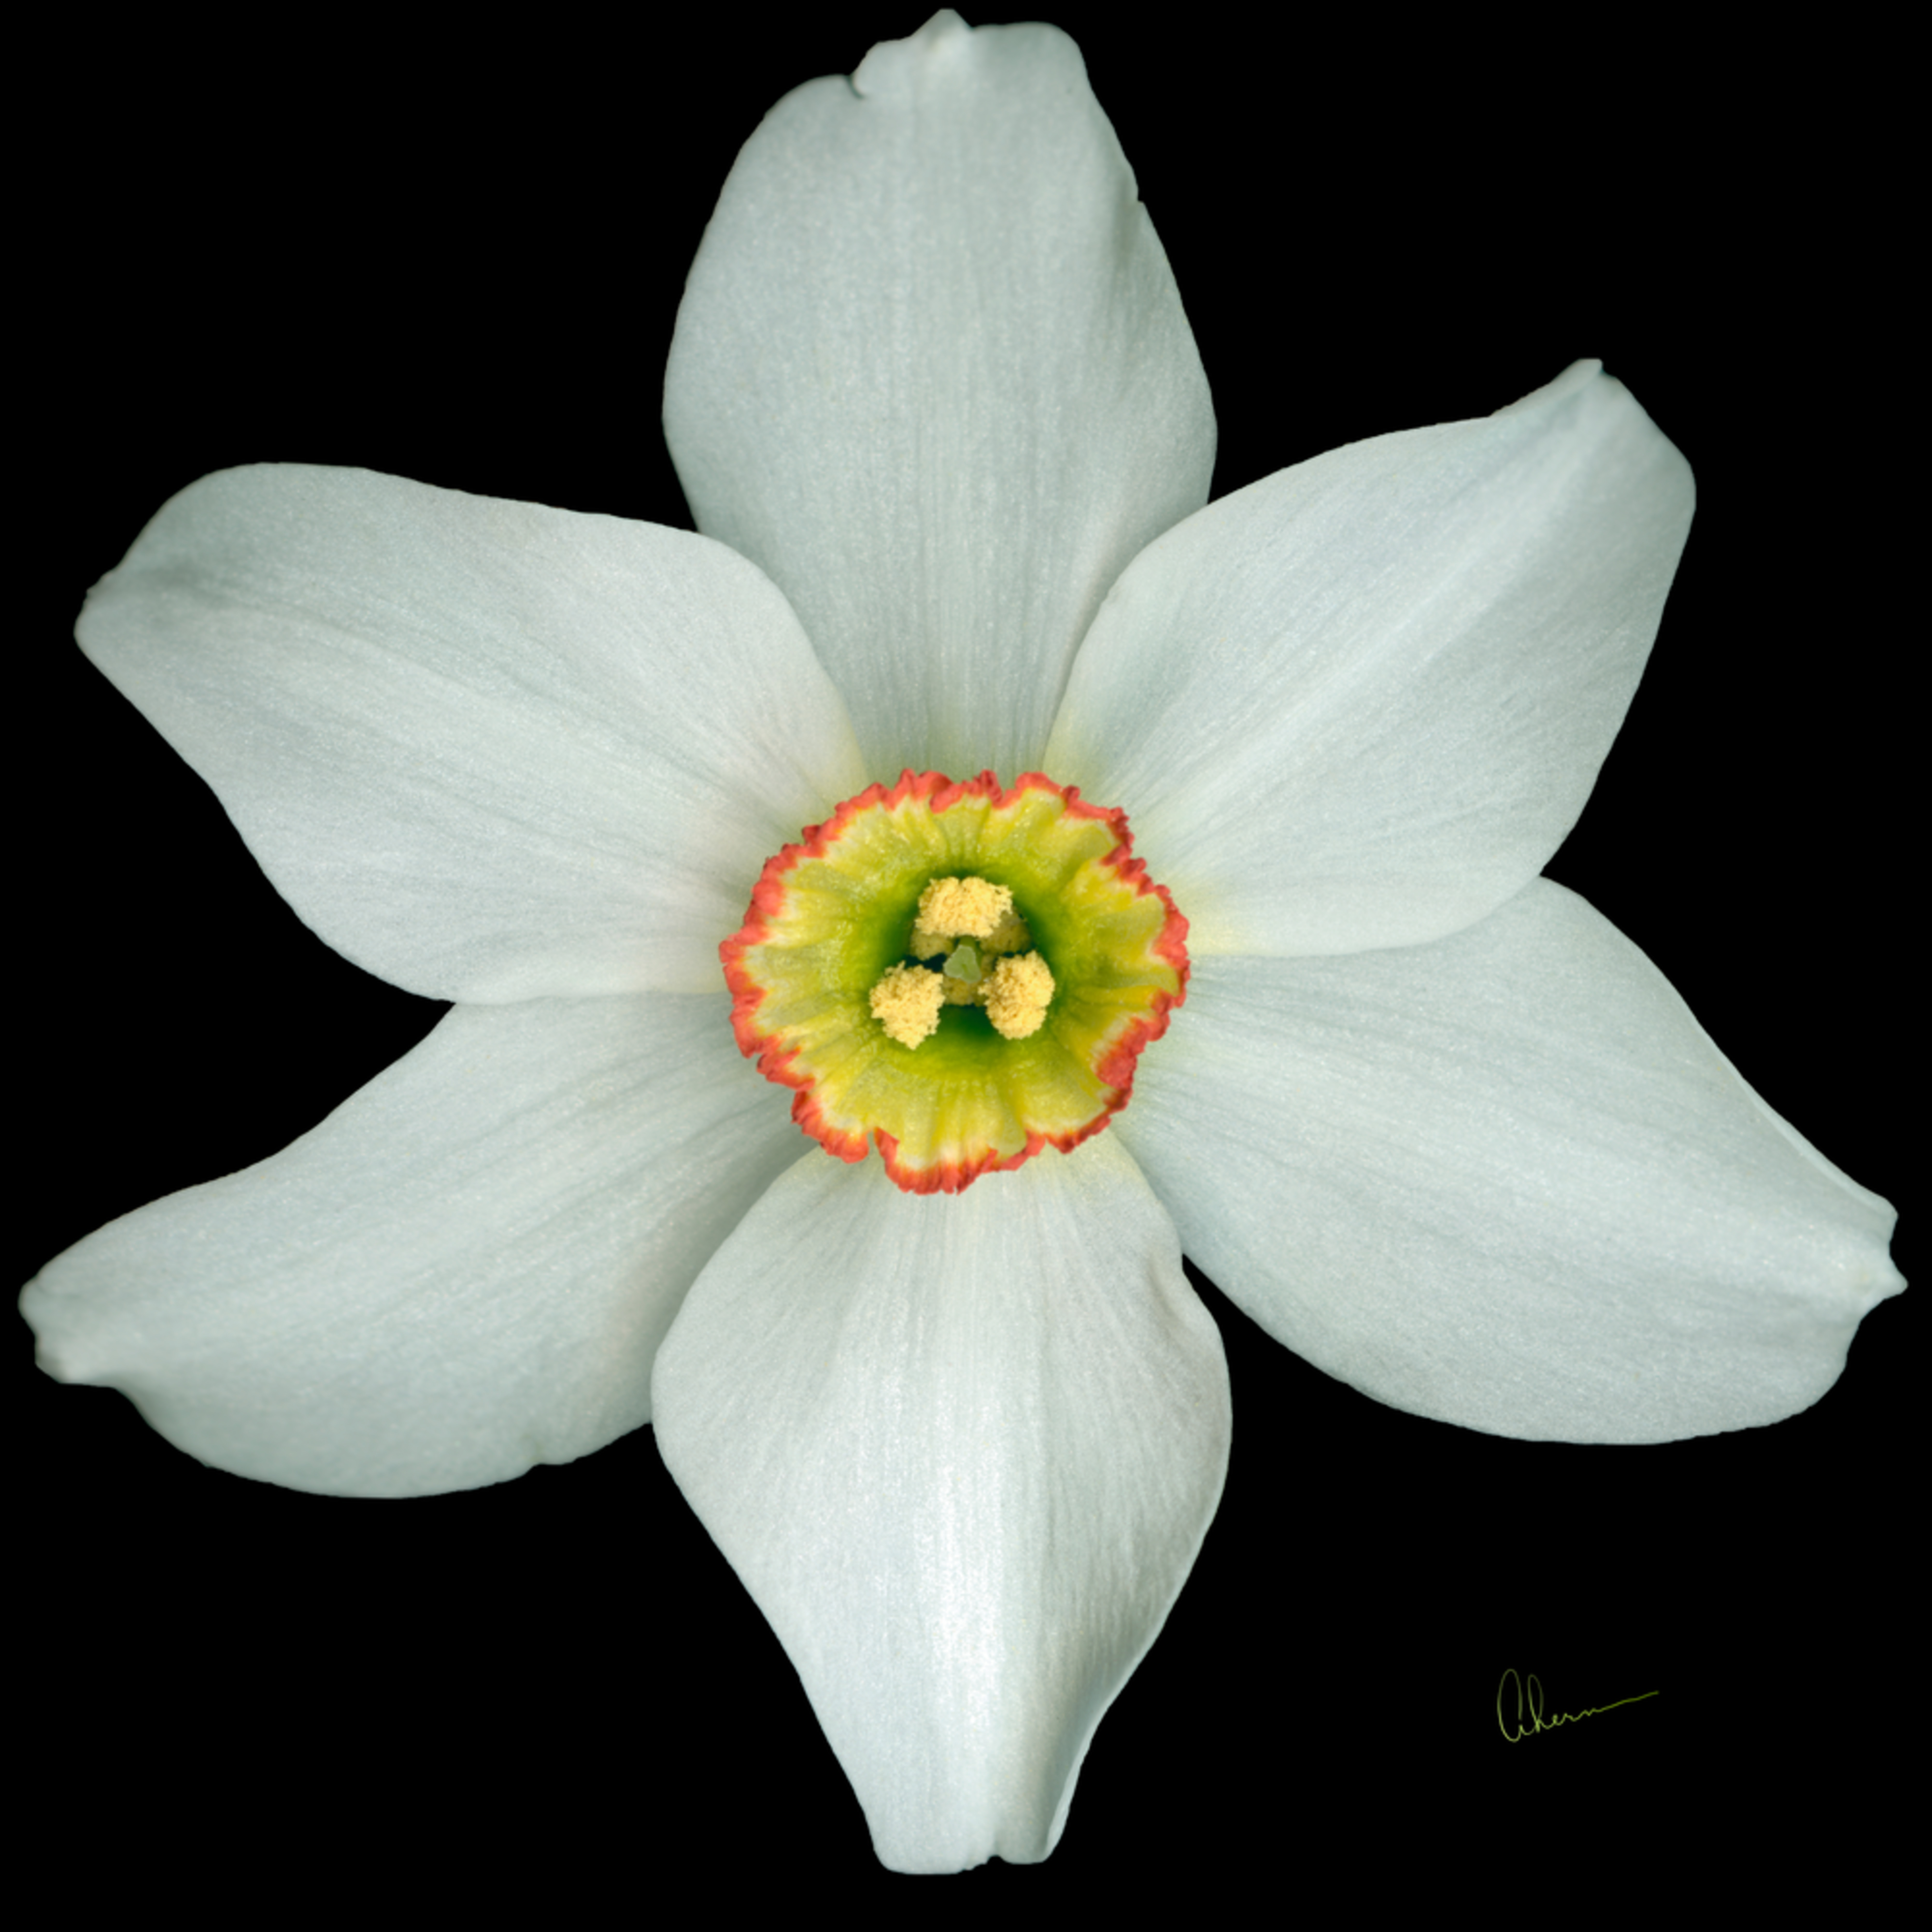 180502 ahern white poeticus daffodil squared 30x30x300 metal print ai5drq